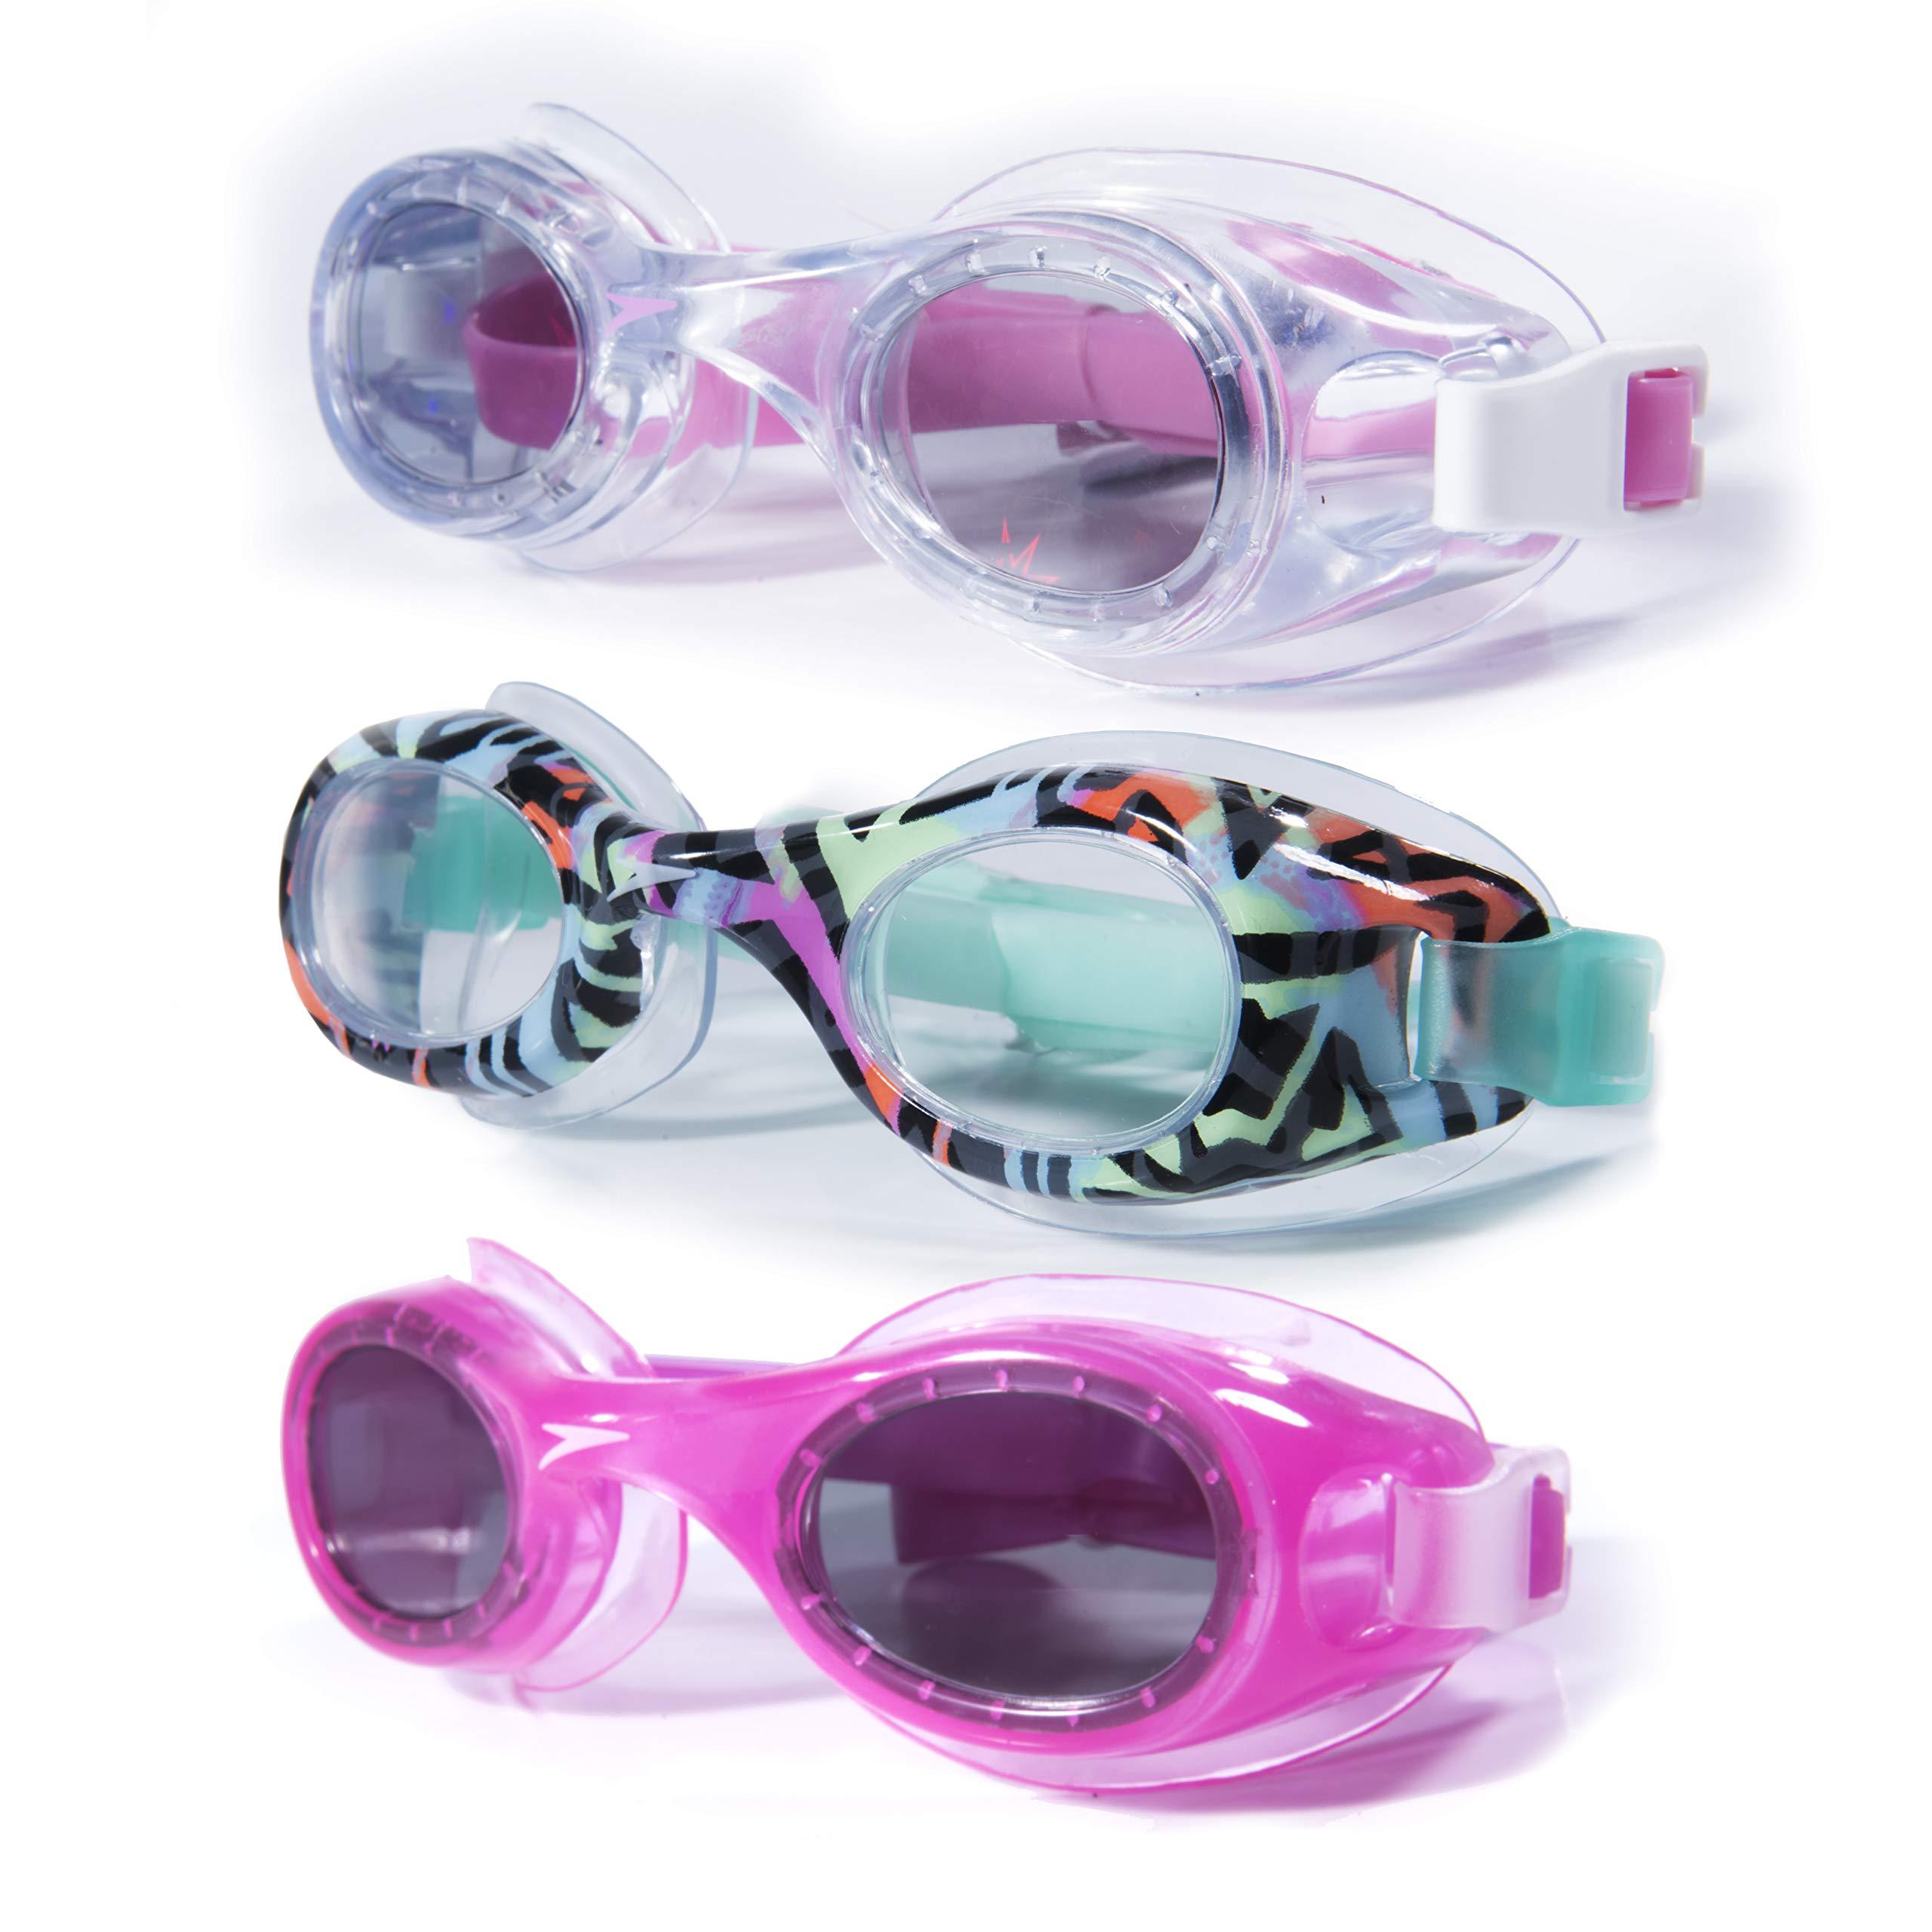 Speedo Goggles Protect Latex Stripes